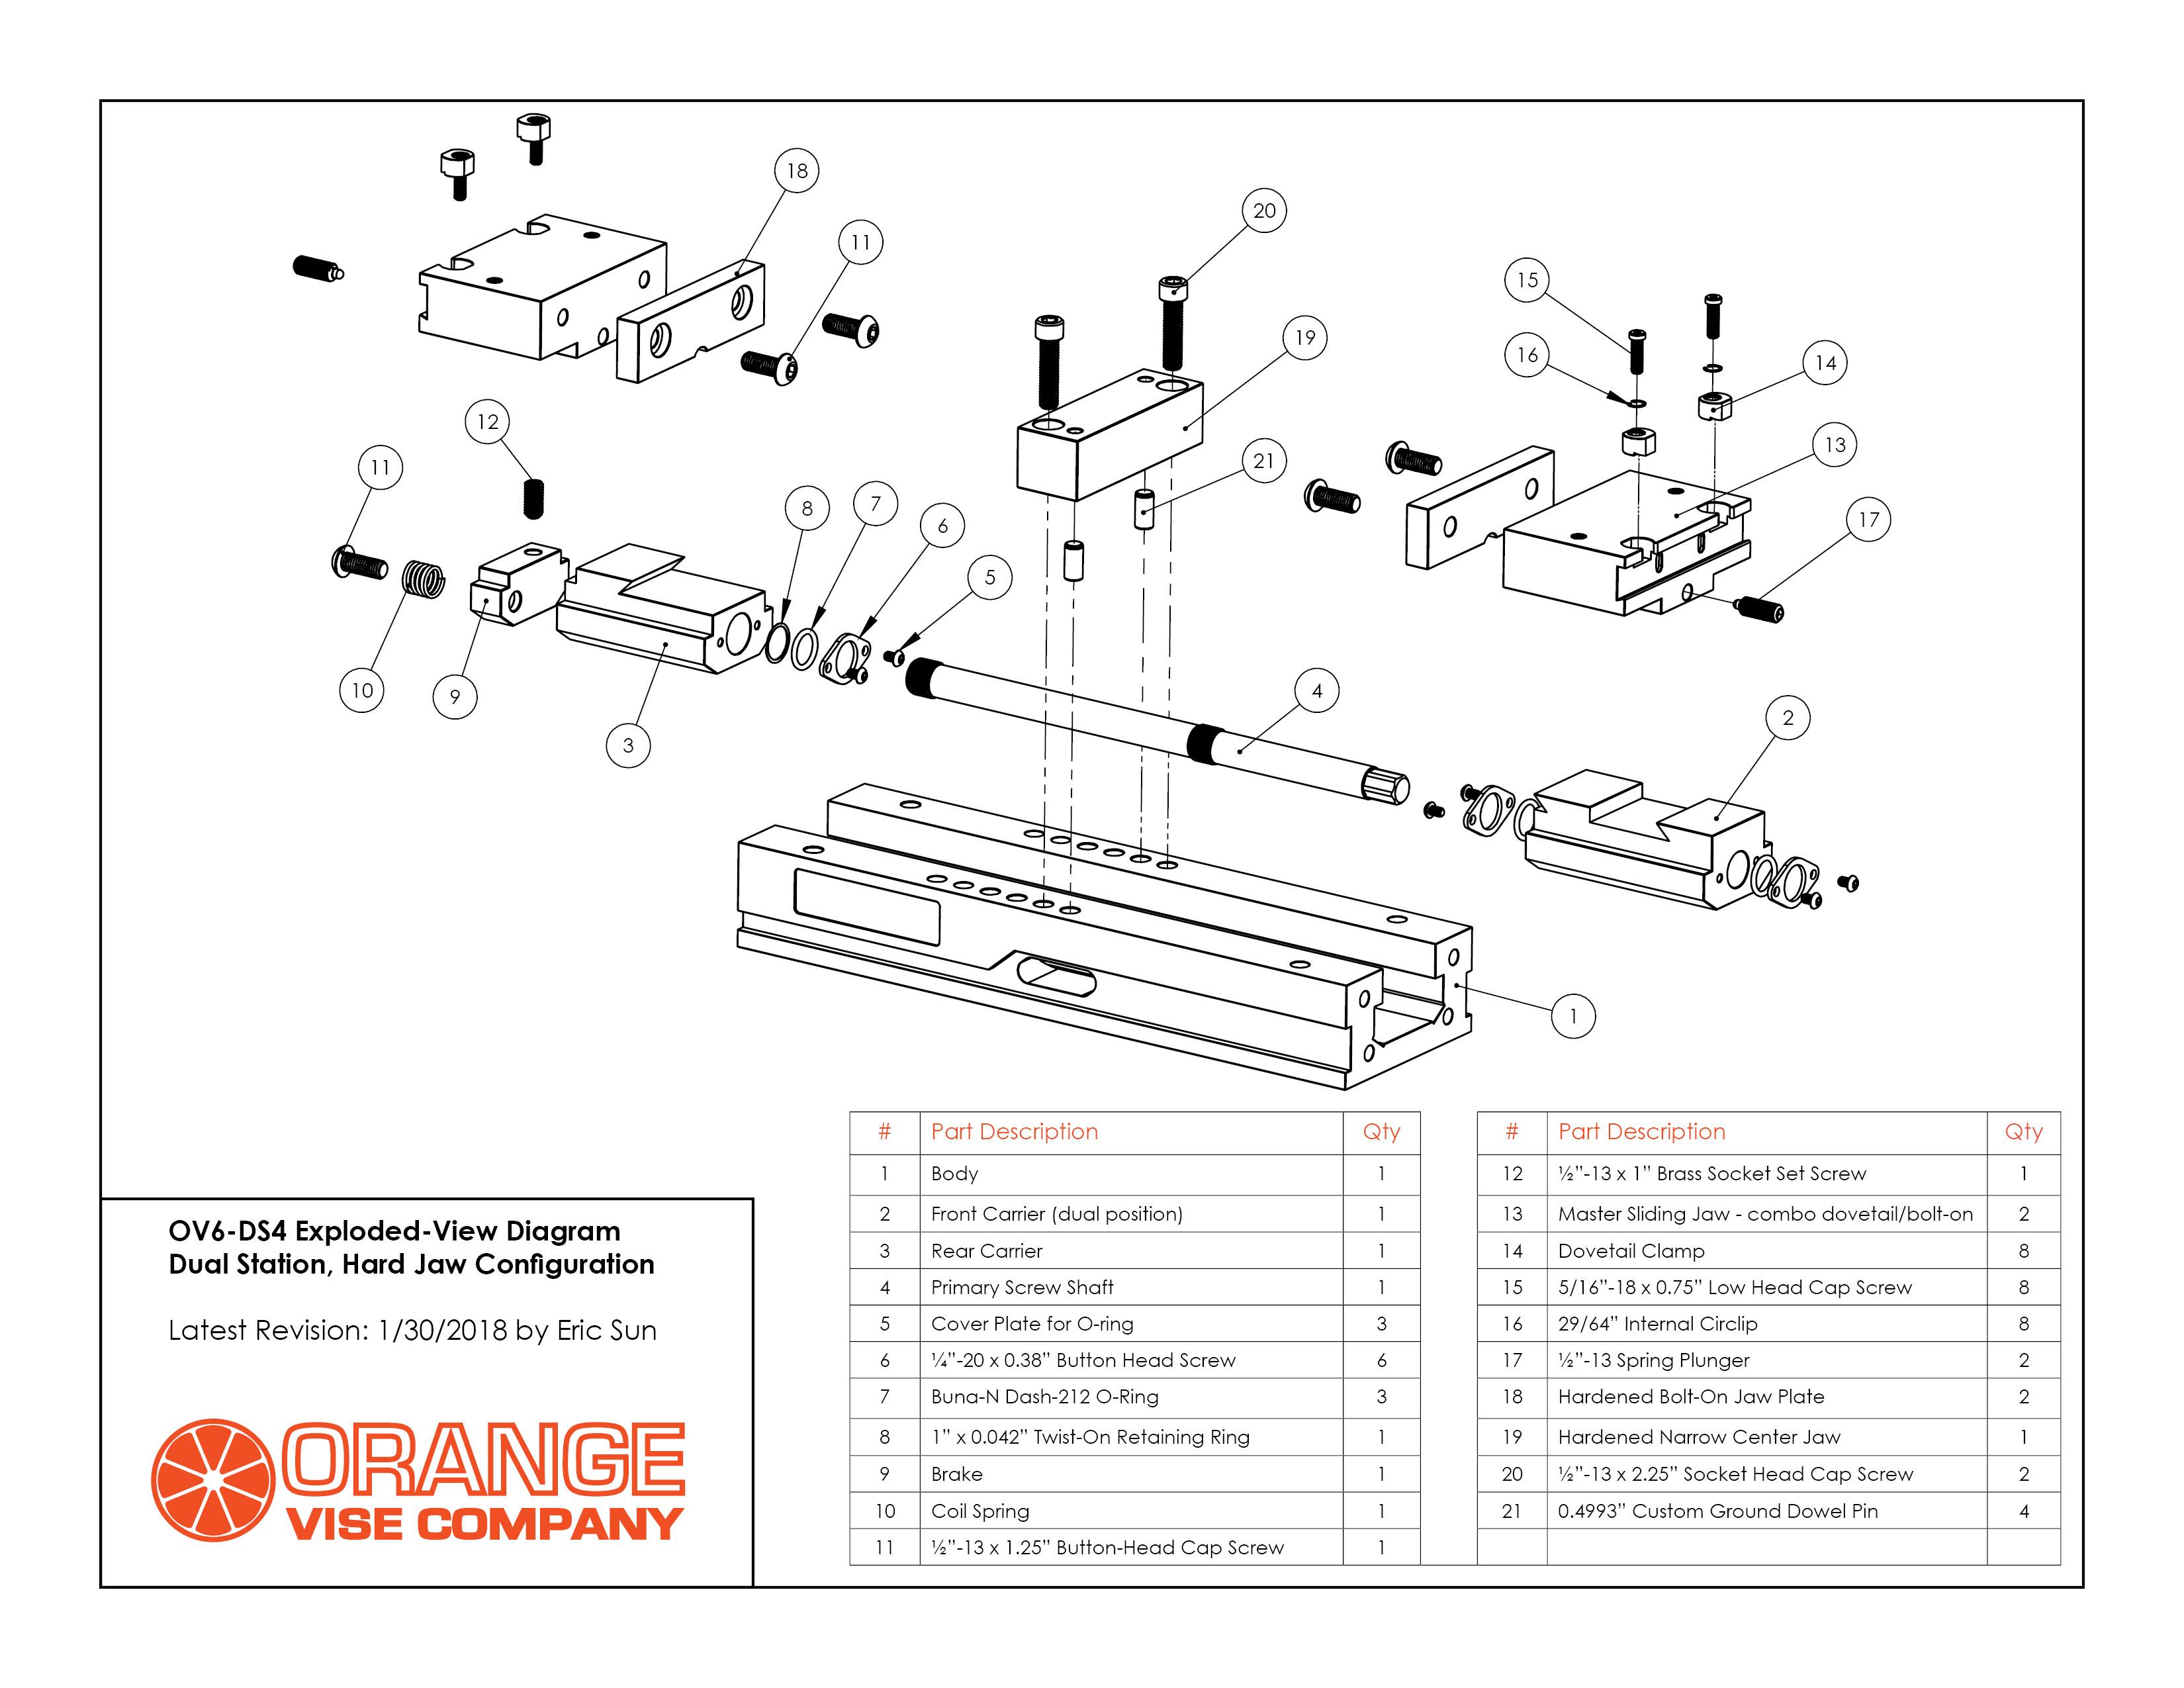 parts of an orange fruit diagram john deere sabre 1438 wiring list hardware and torque values vise